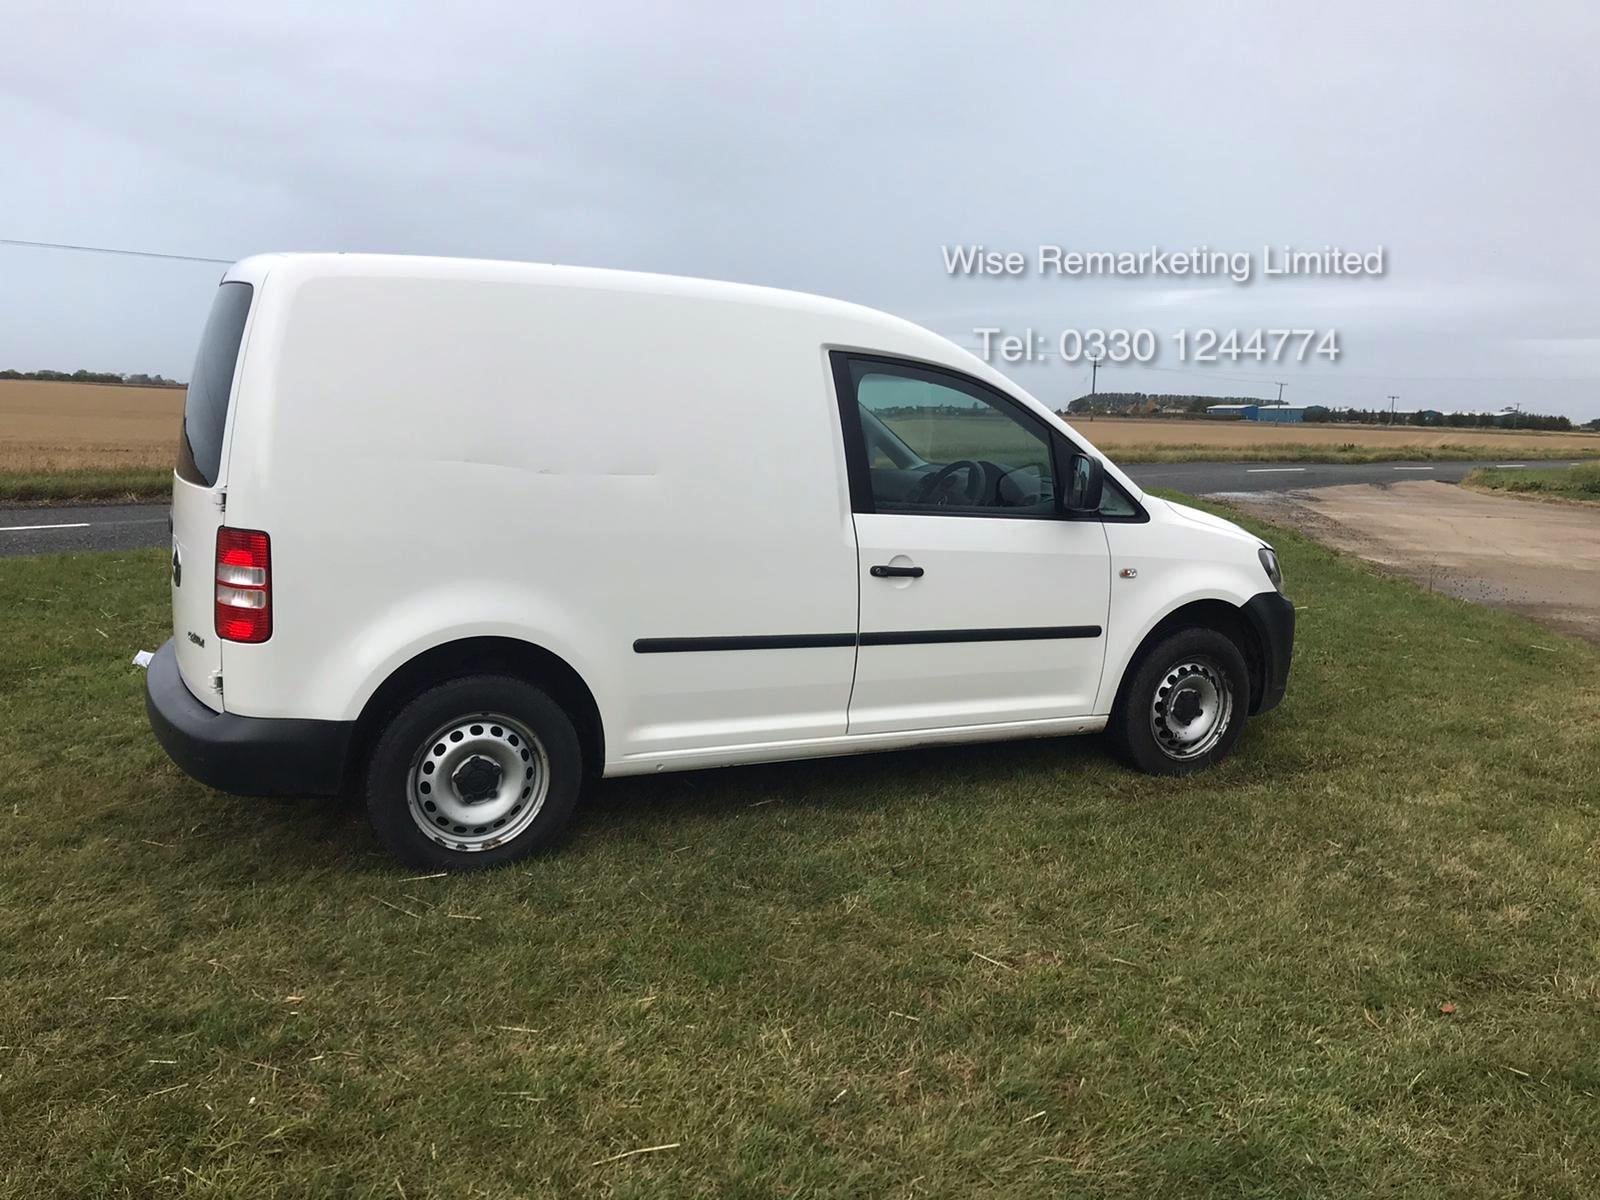 Volkswagen Caddy C20 + Startline 1.6 Tdi - 2014 Model - White - Side Loading Door - Ply Lined - Image 3 of 13